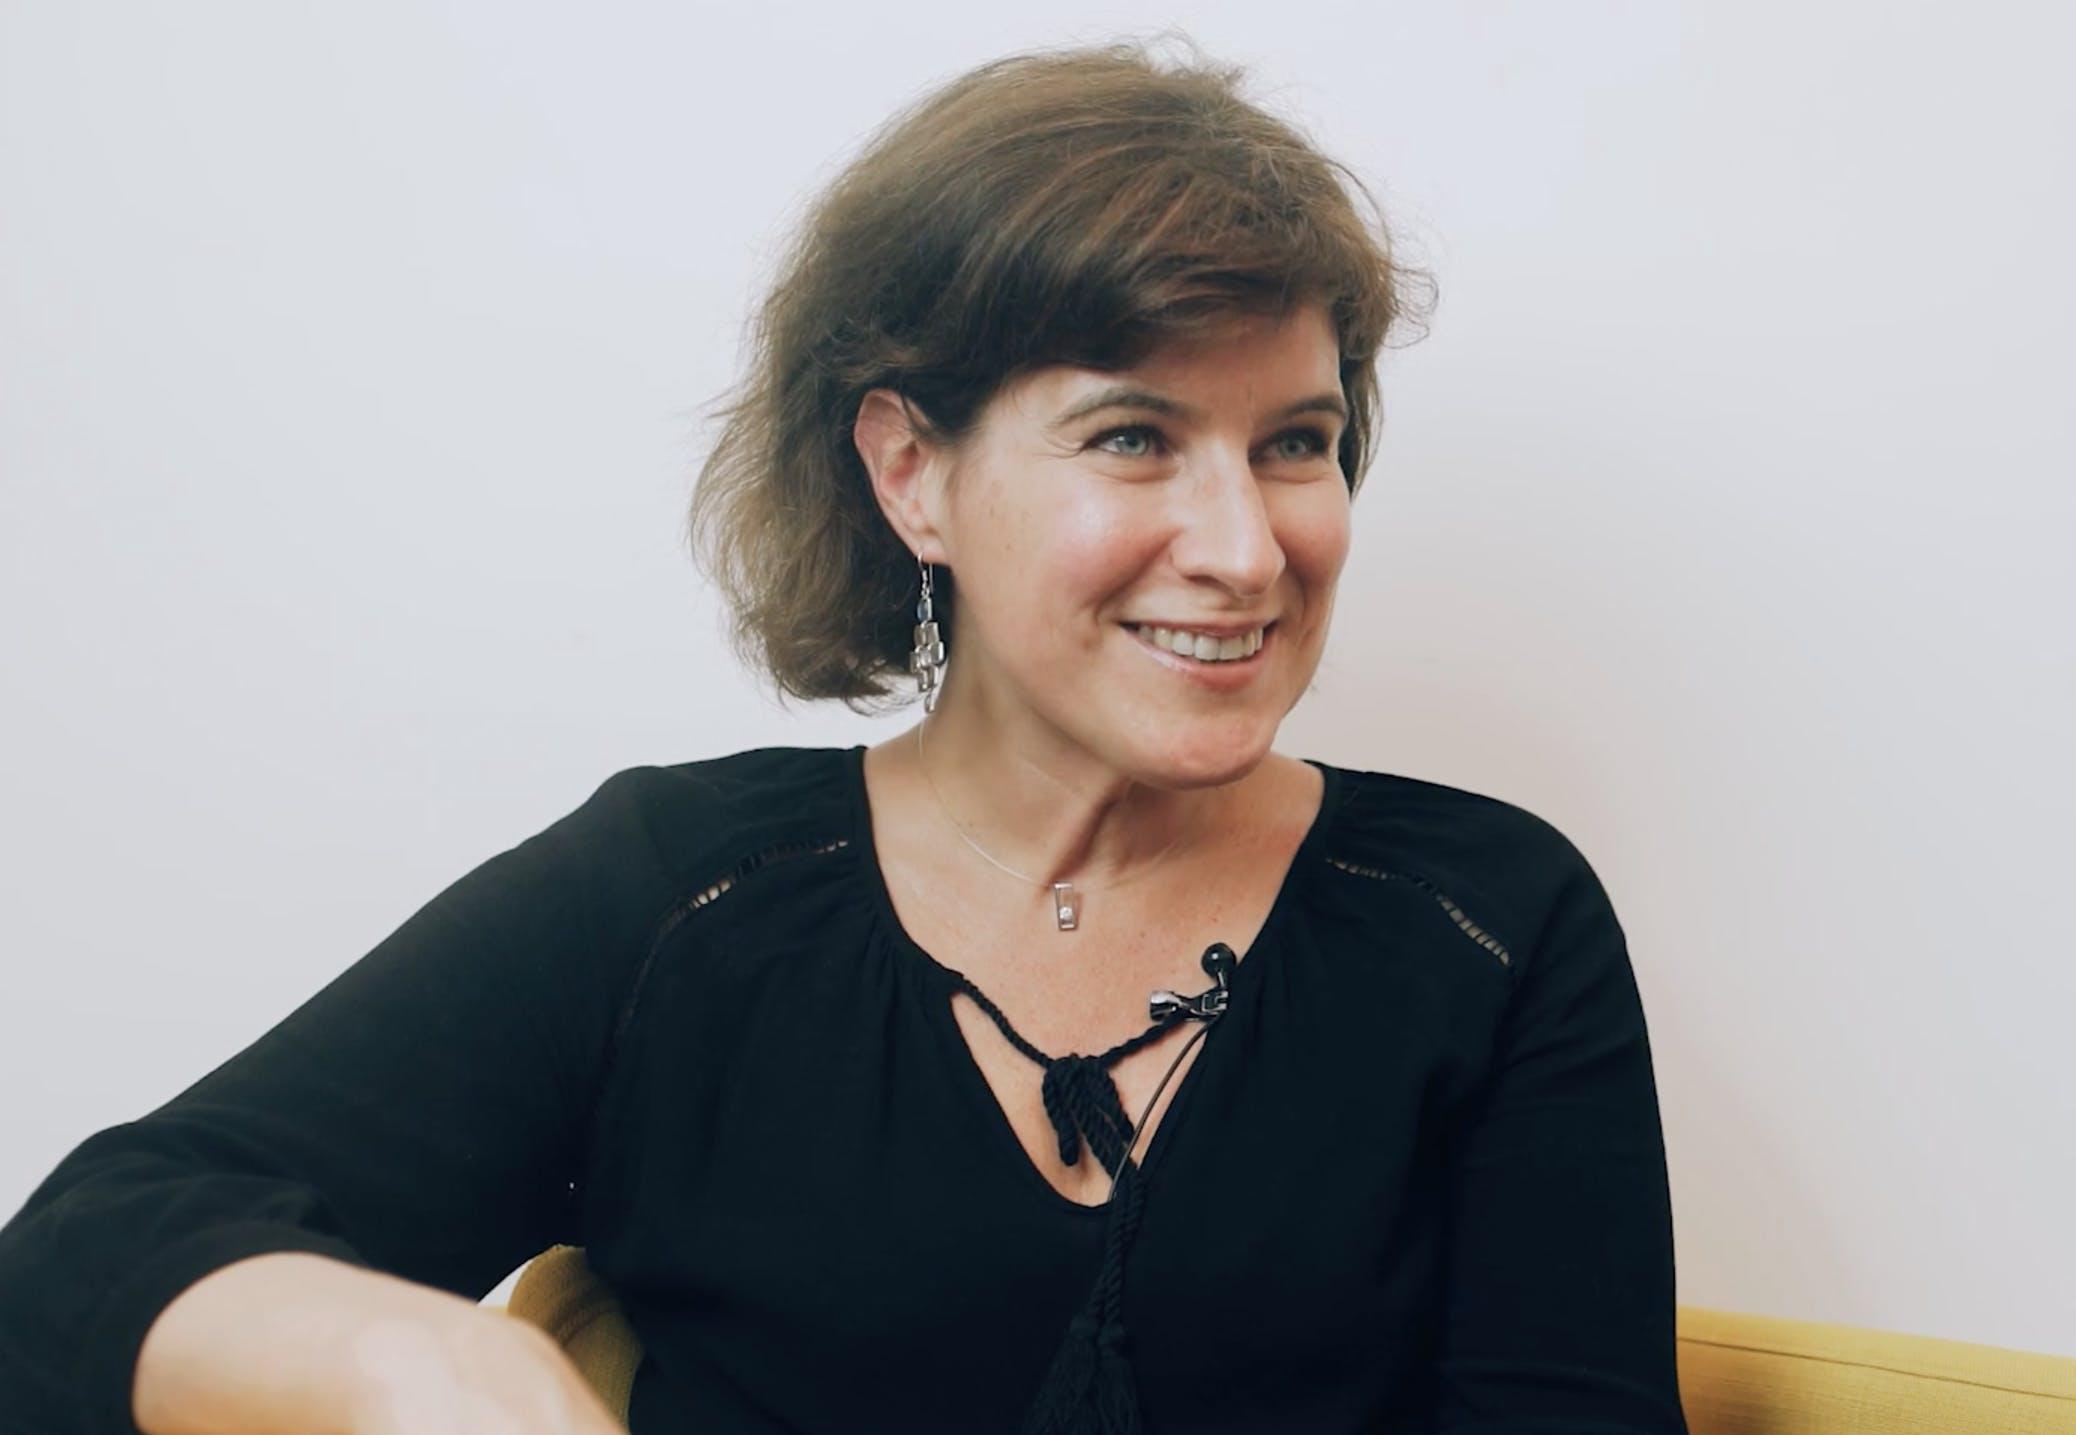 Mathilde Andrade, Directrice Générale Adjointe